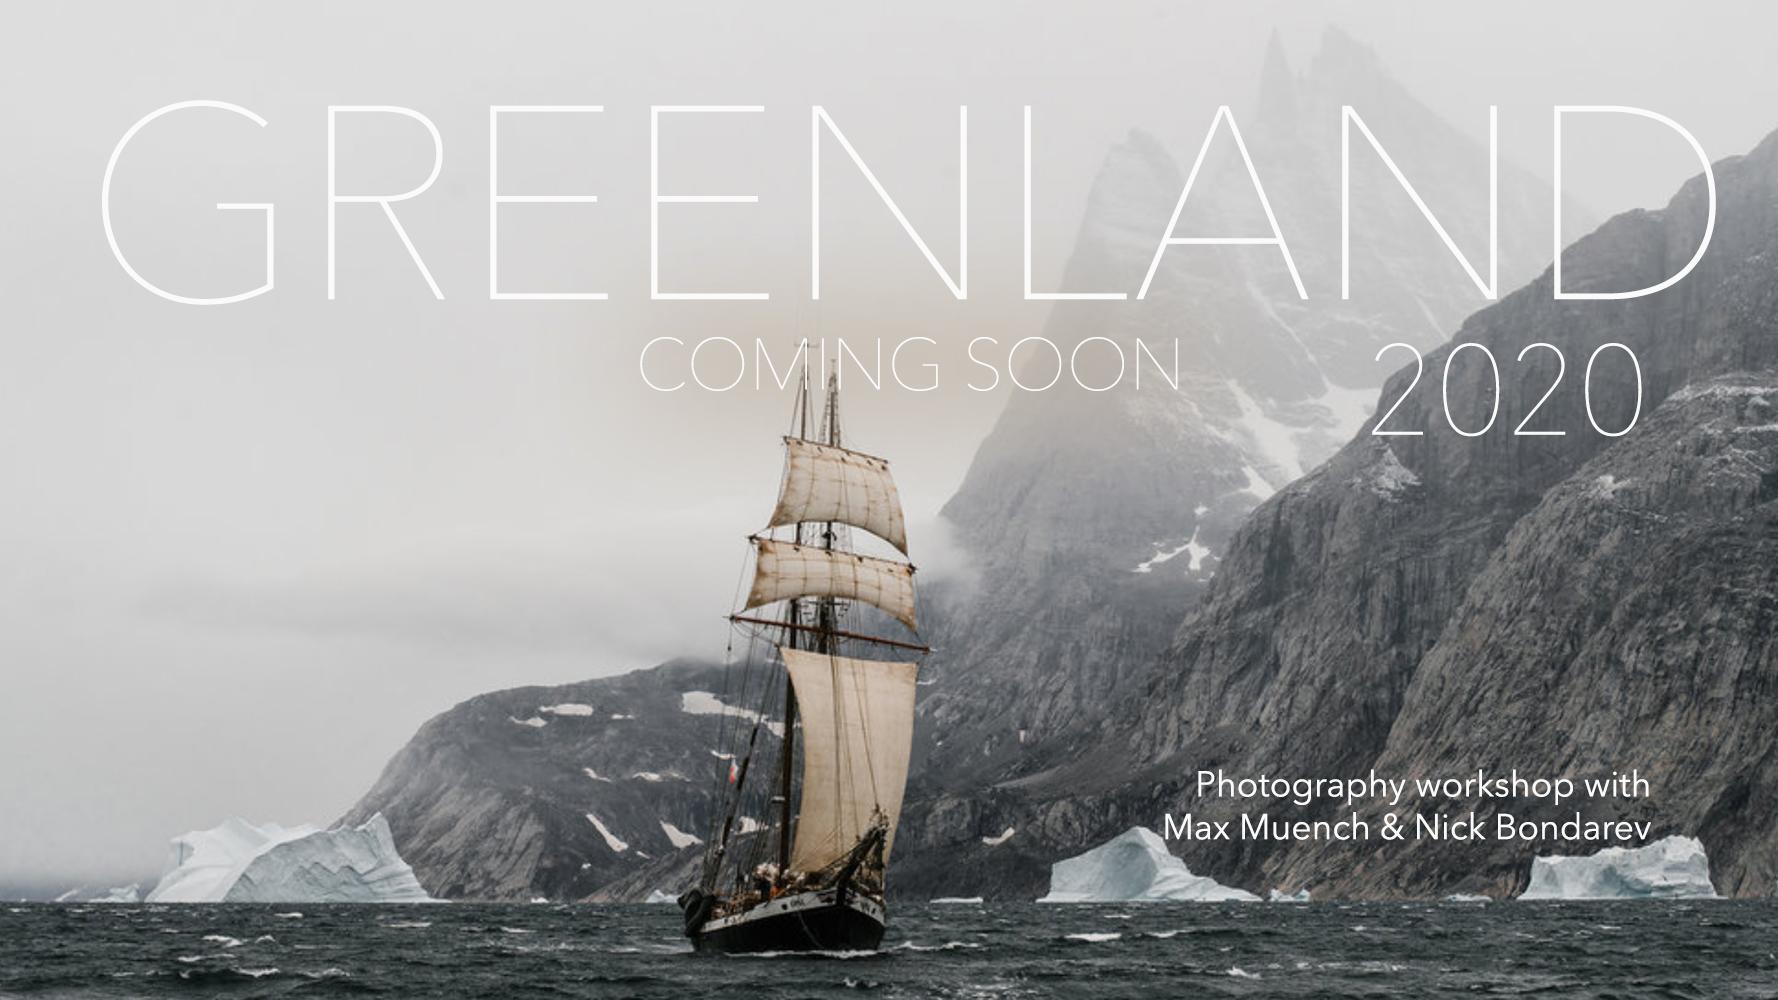 MaxMuench_Greenland2020.jpg